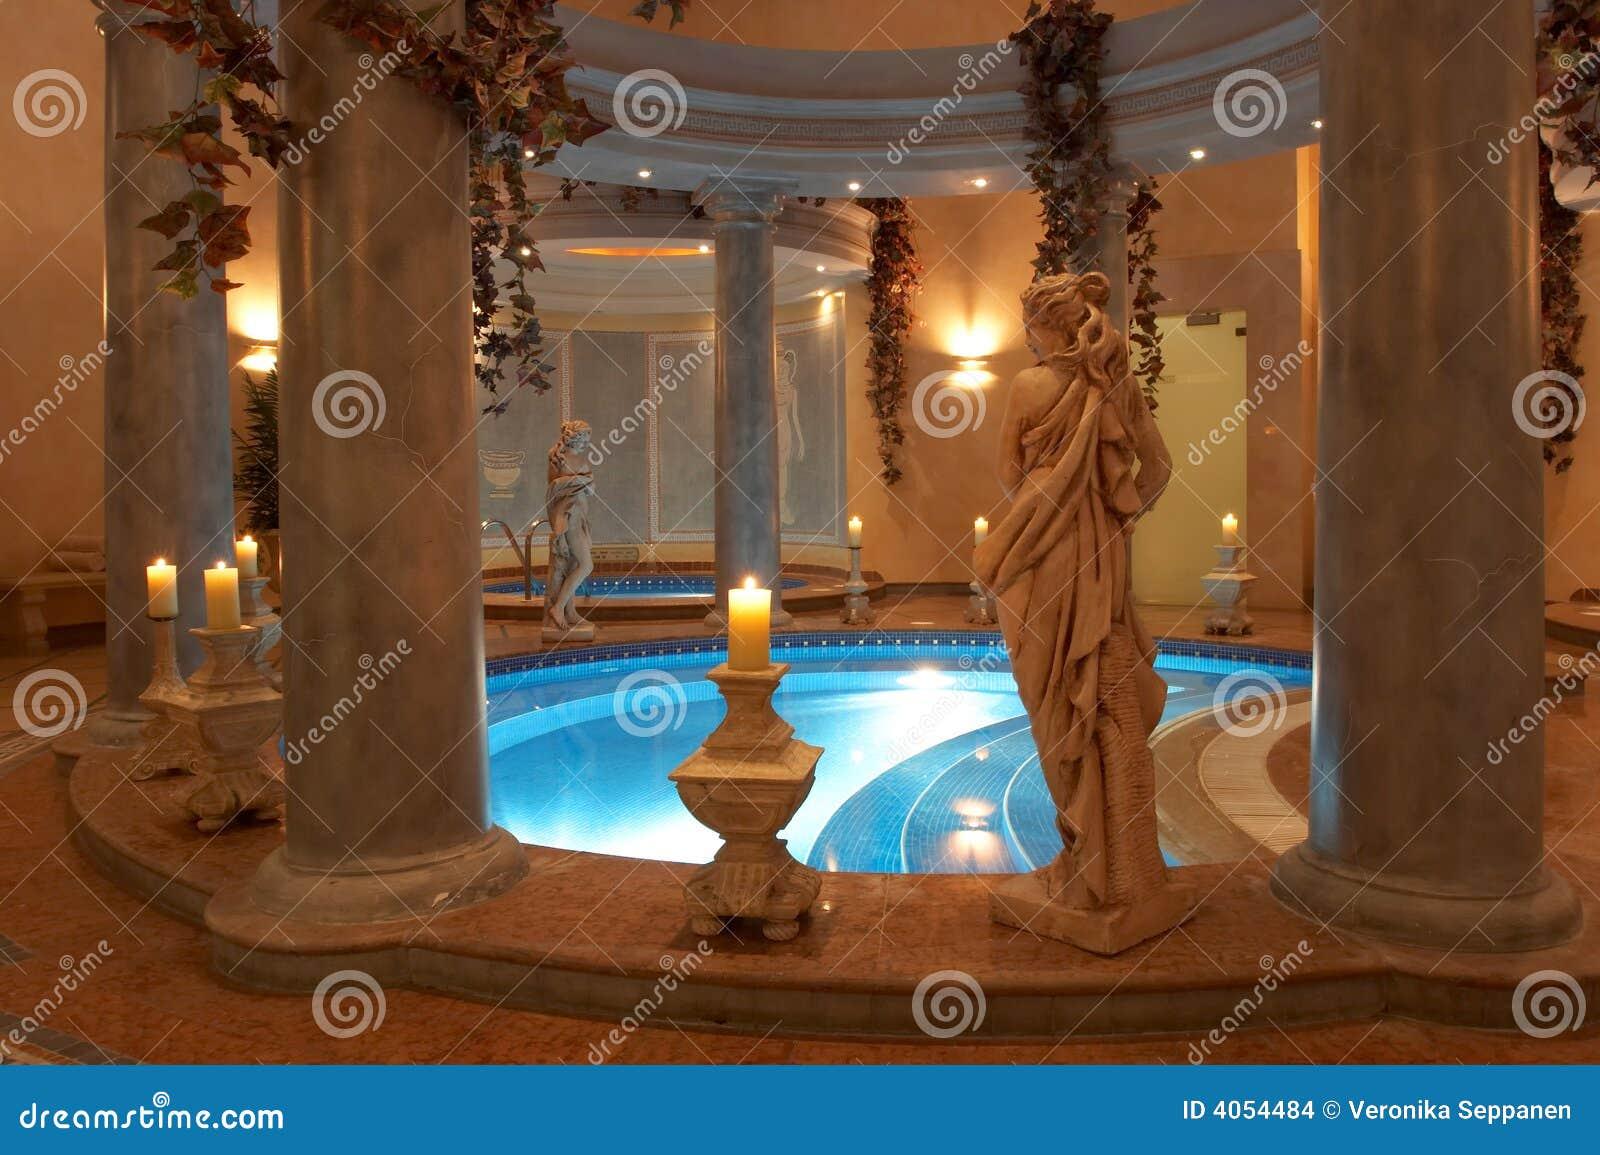 Spa With Roman Columns Stock Photo Image Of Aphrodite 4054484